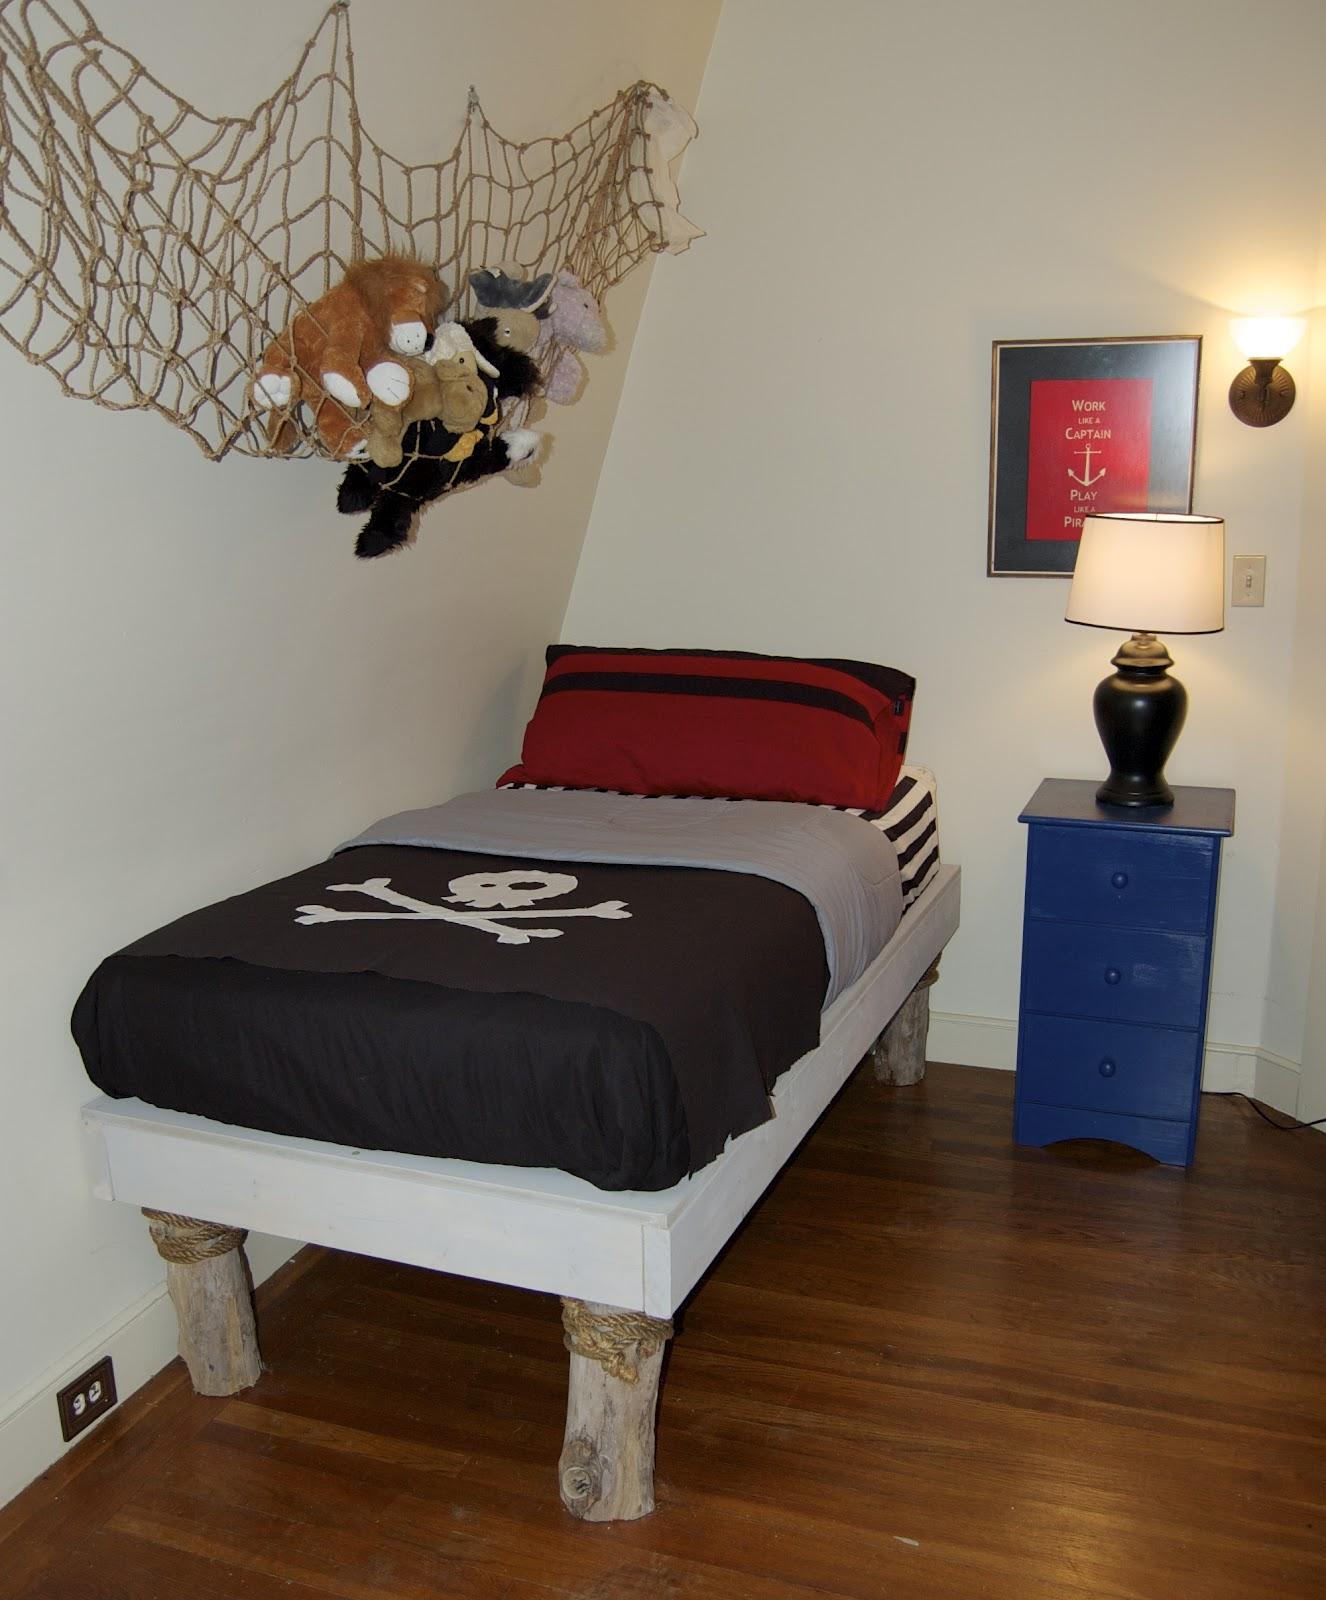 Pirate Decor For Bedroom Seaside Shelter Diy Pirate Bedroom